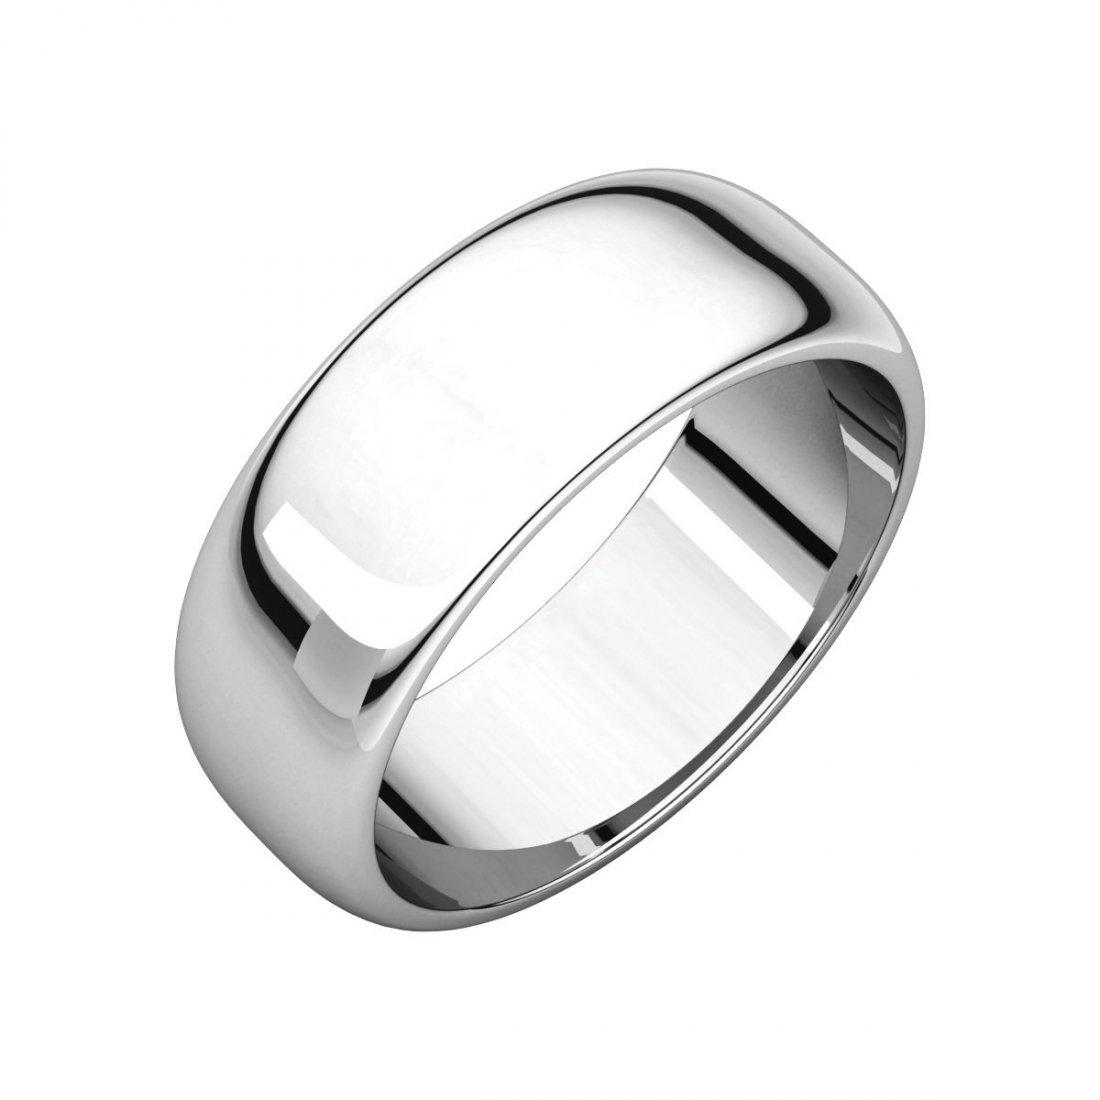 Ring - 14k White Gold 7mm Half Round Band